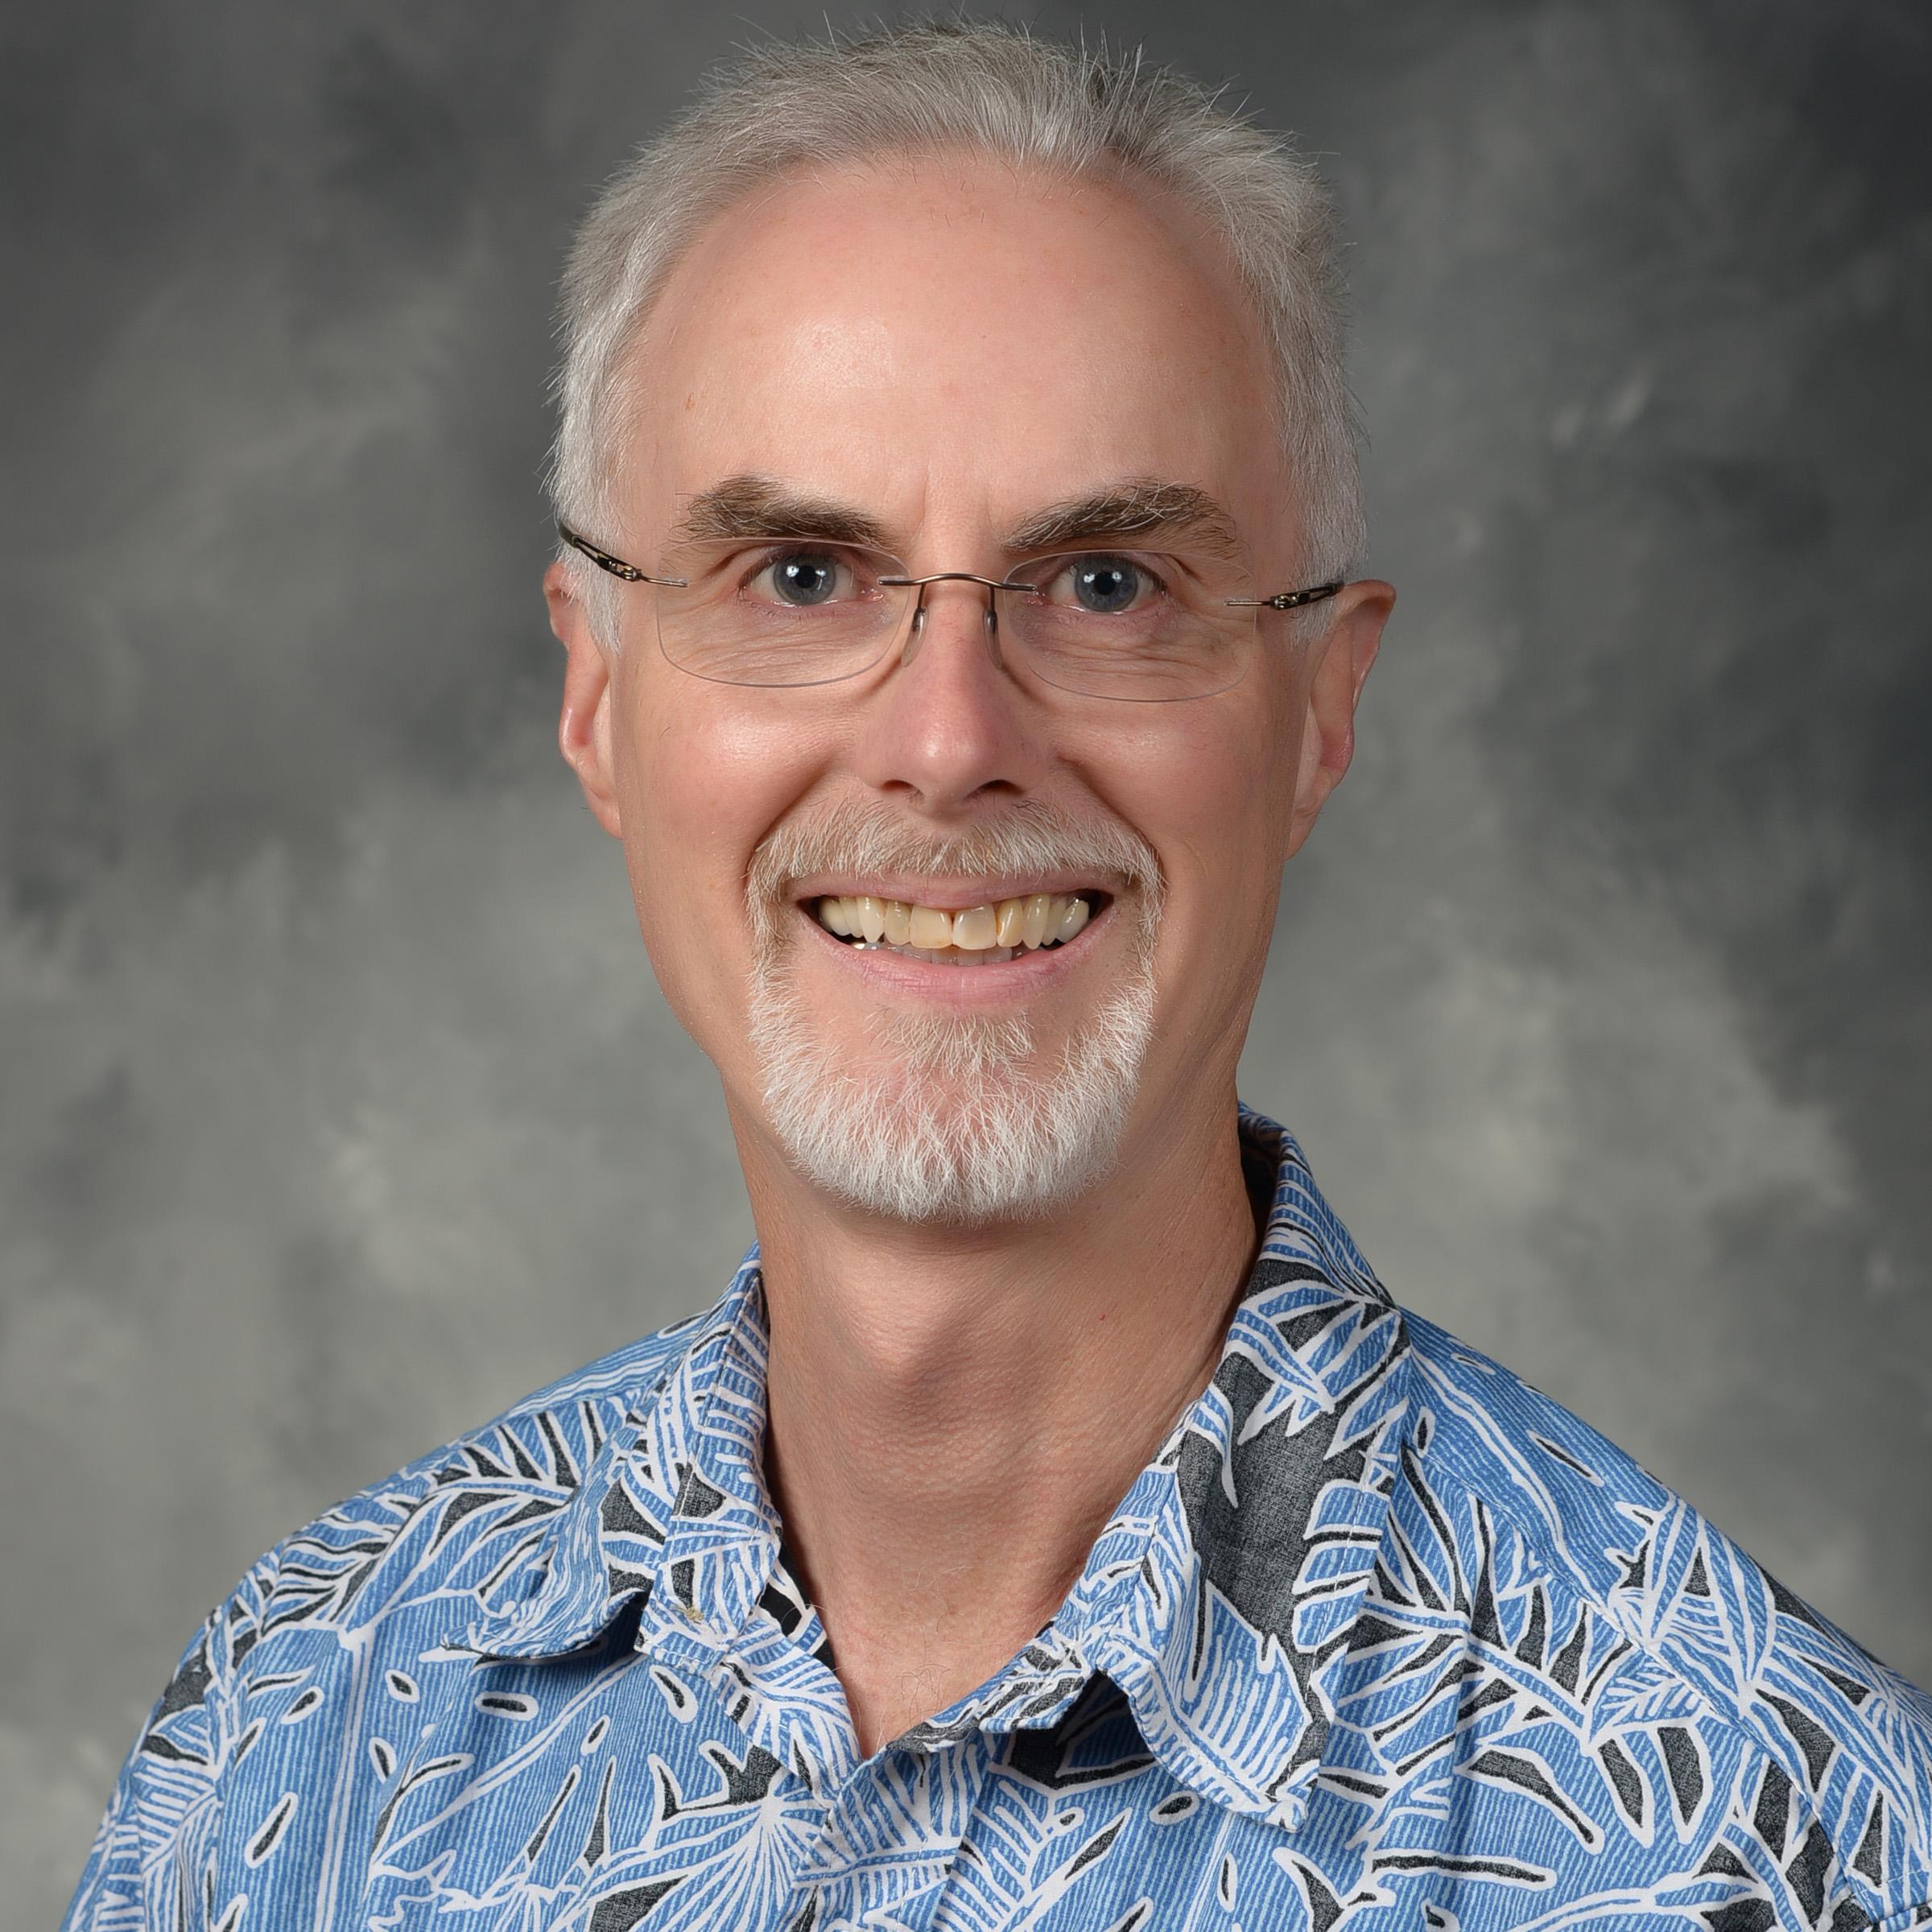 KENNETH FAULKNER's Profile Photo